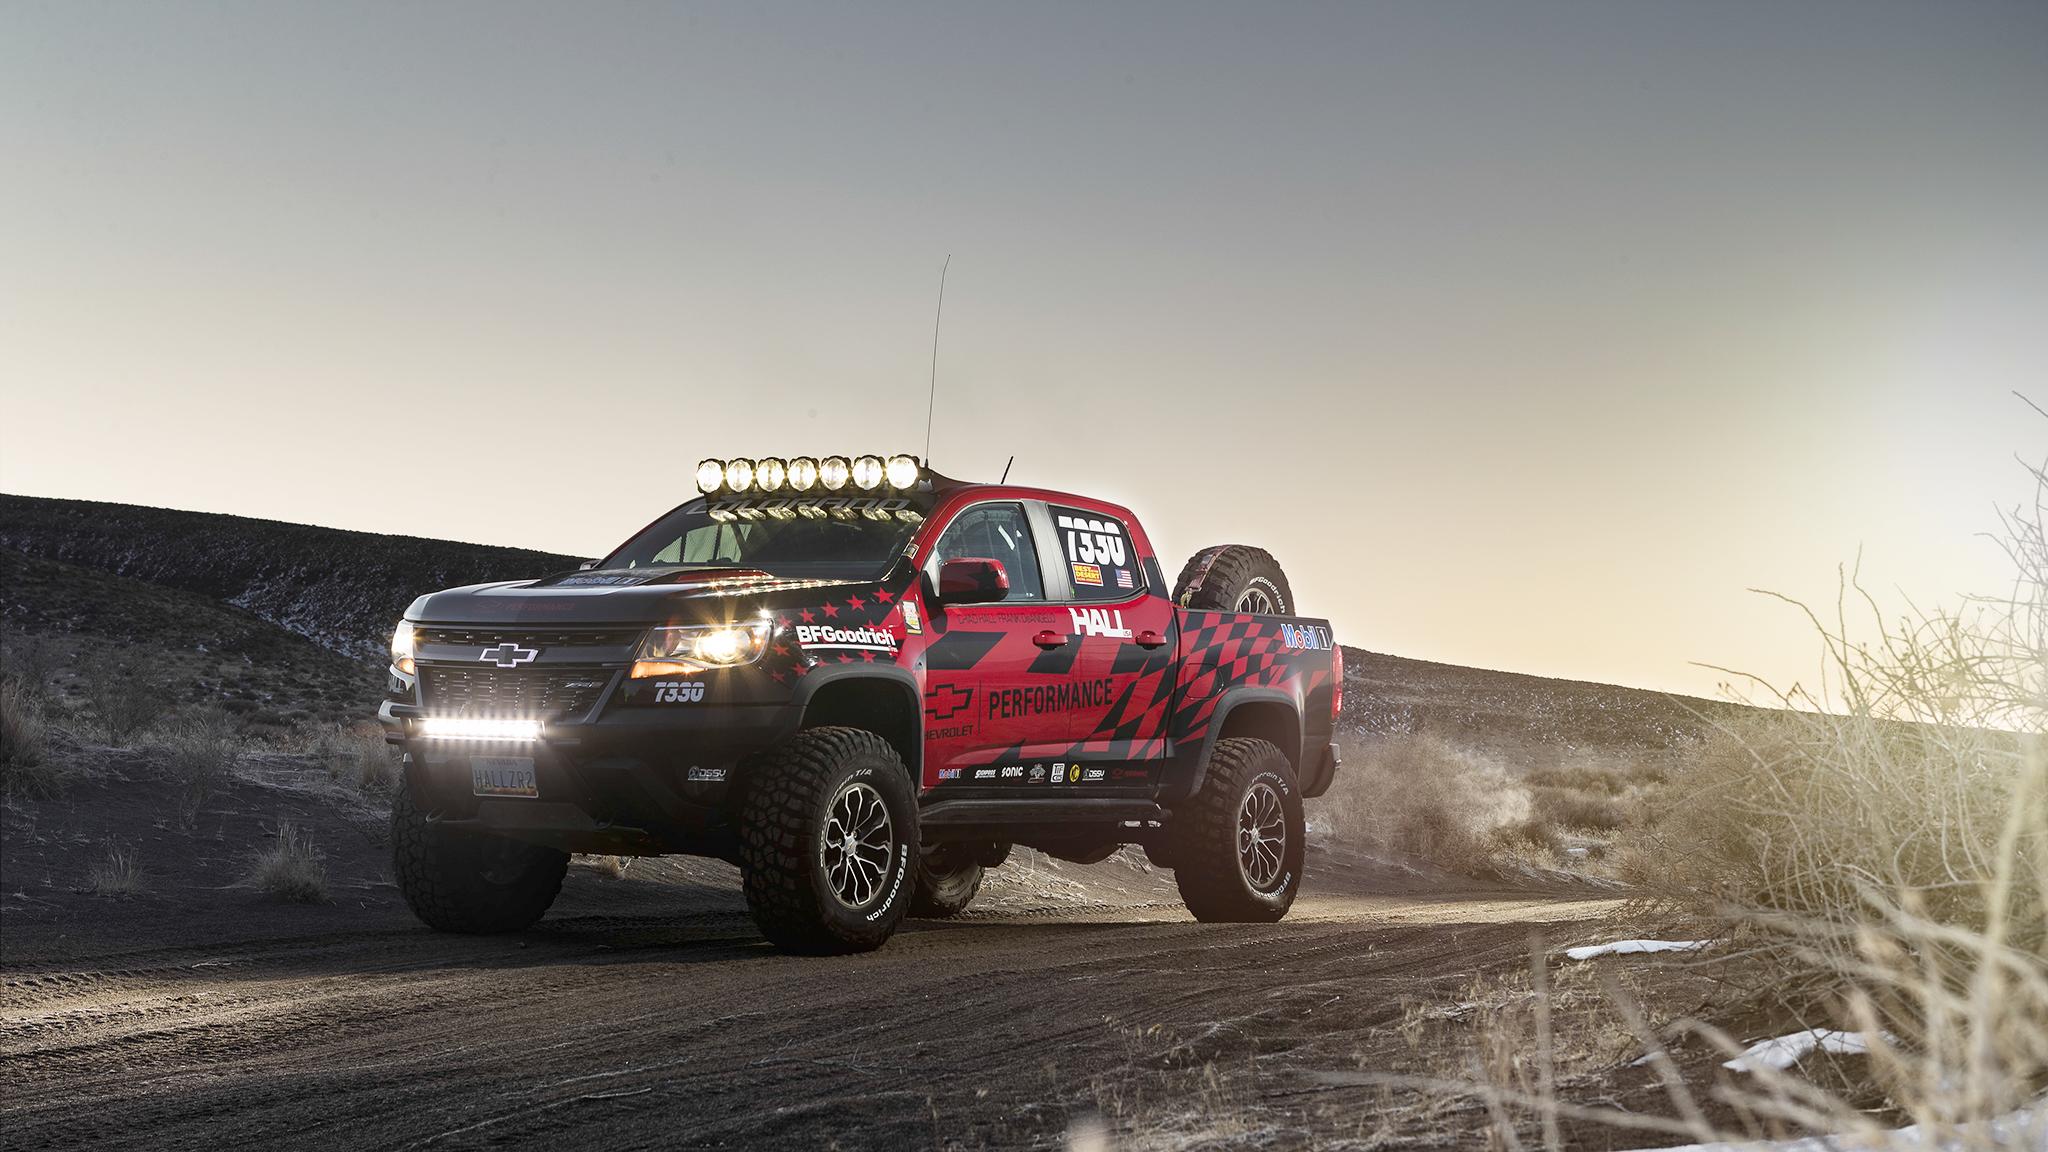 2019 Chevrolet Colorado ZR2 Desert Racer Conversion Kit ...